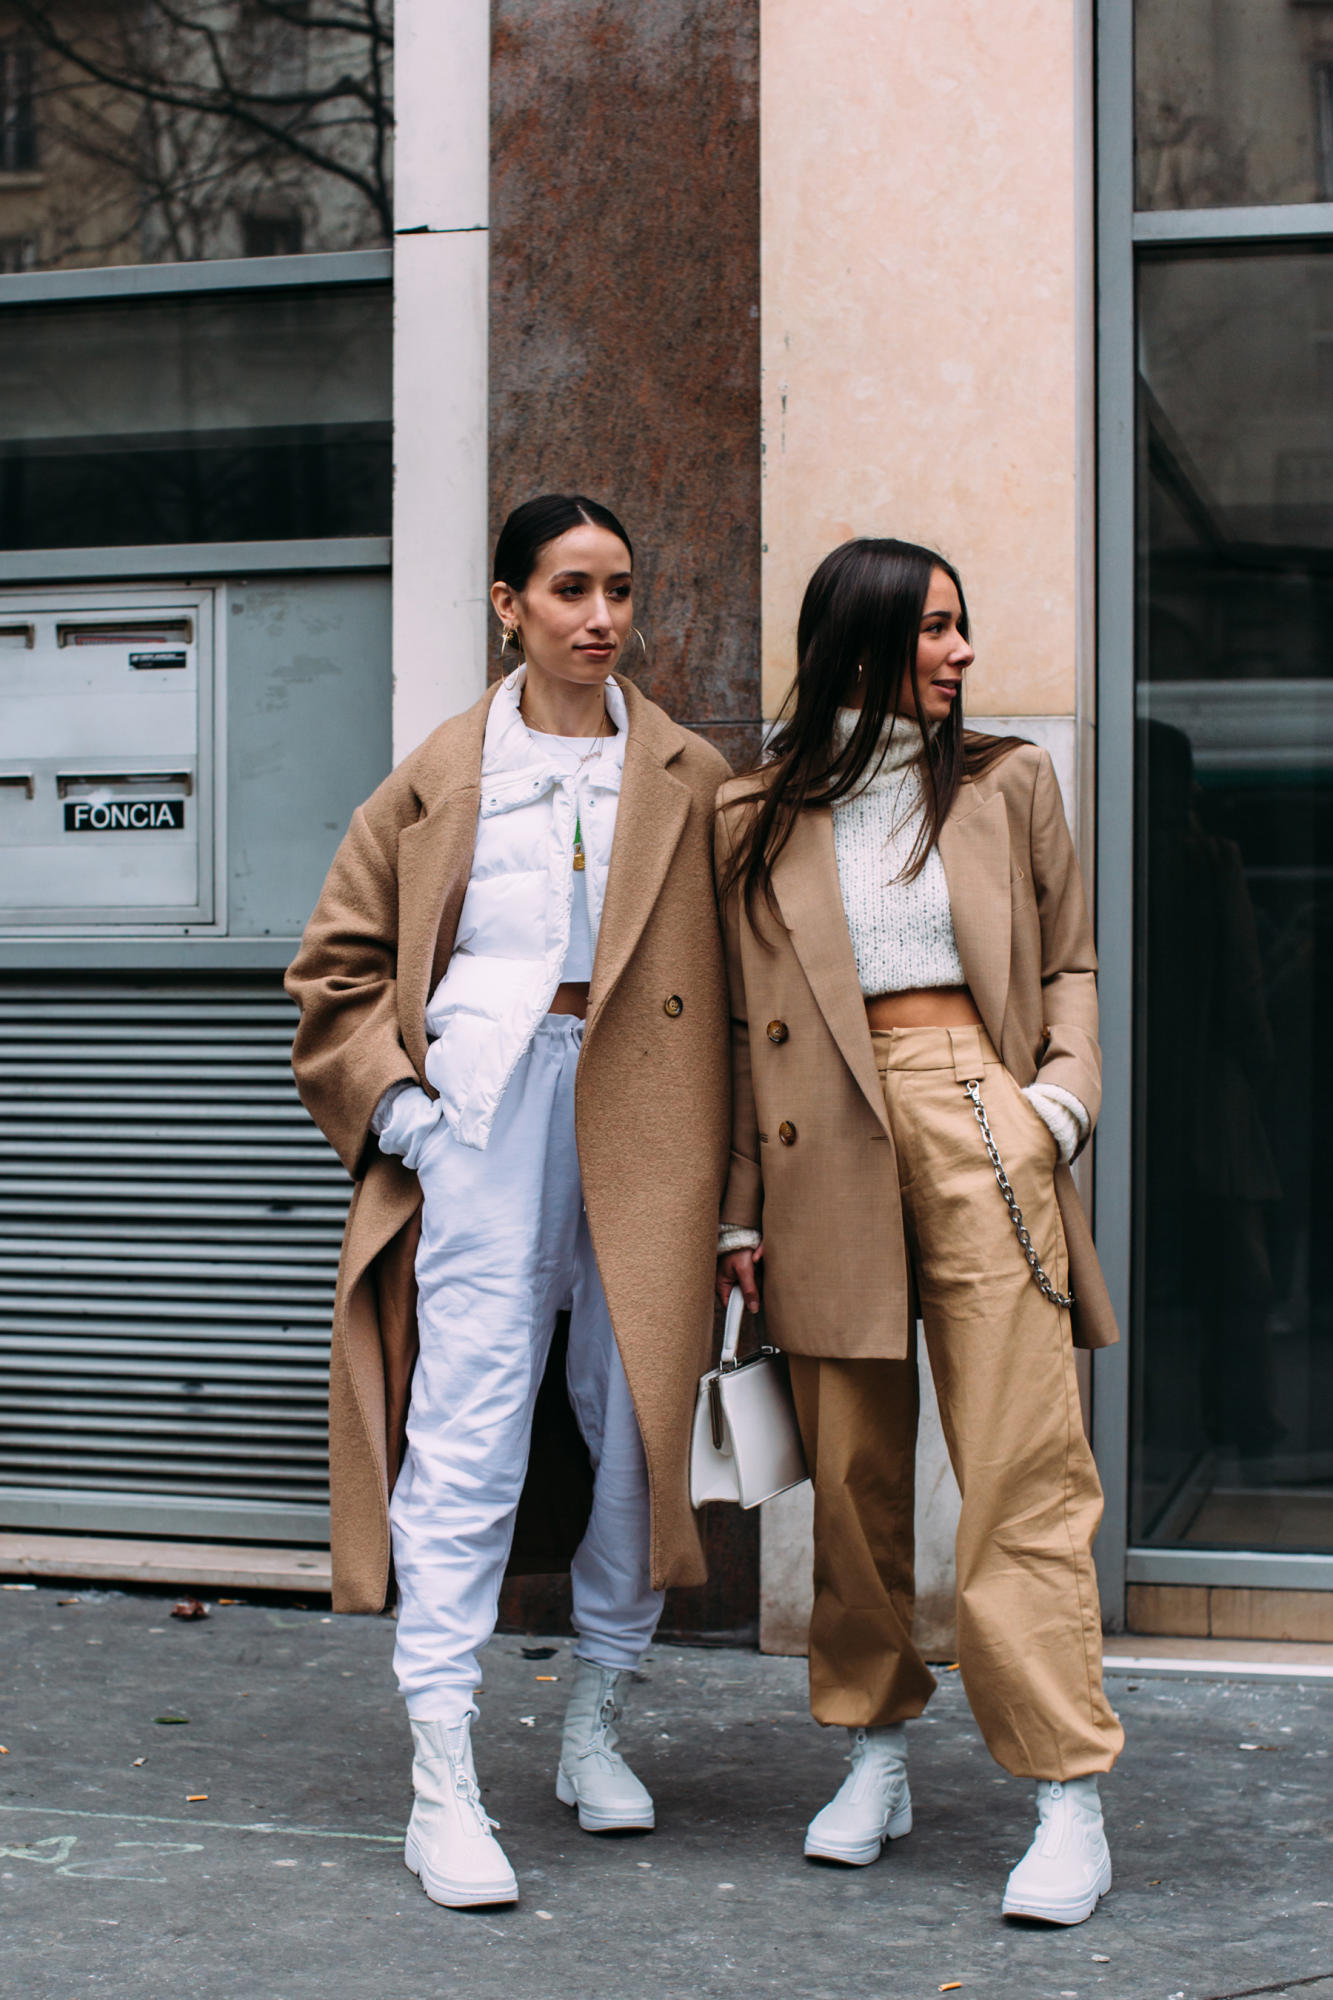 paris-fashion-week-street-style-fall-2018-day-5-53.jpg